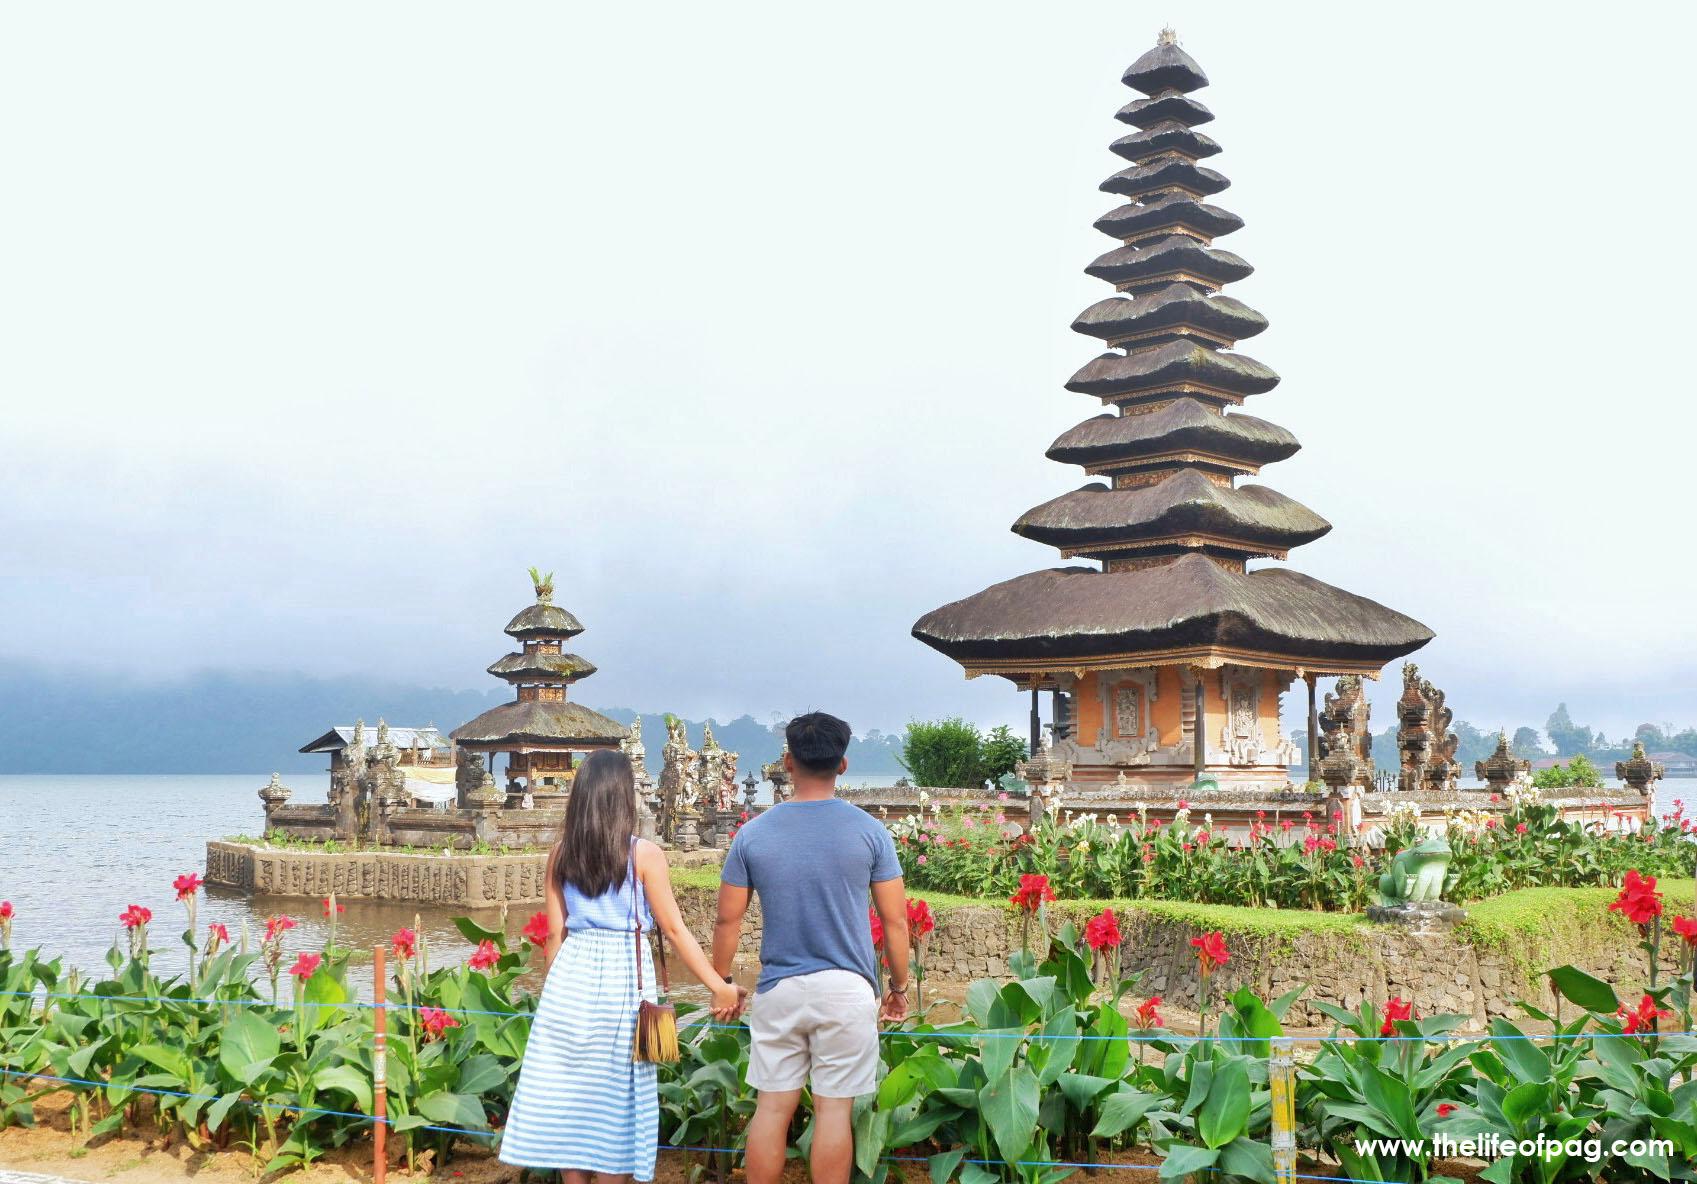 Pura Ulun Danu Beratan The Floating Temple The Life Of Pag